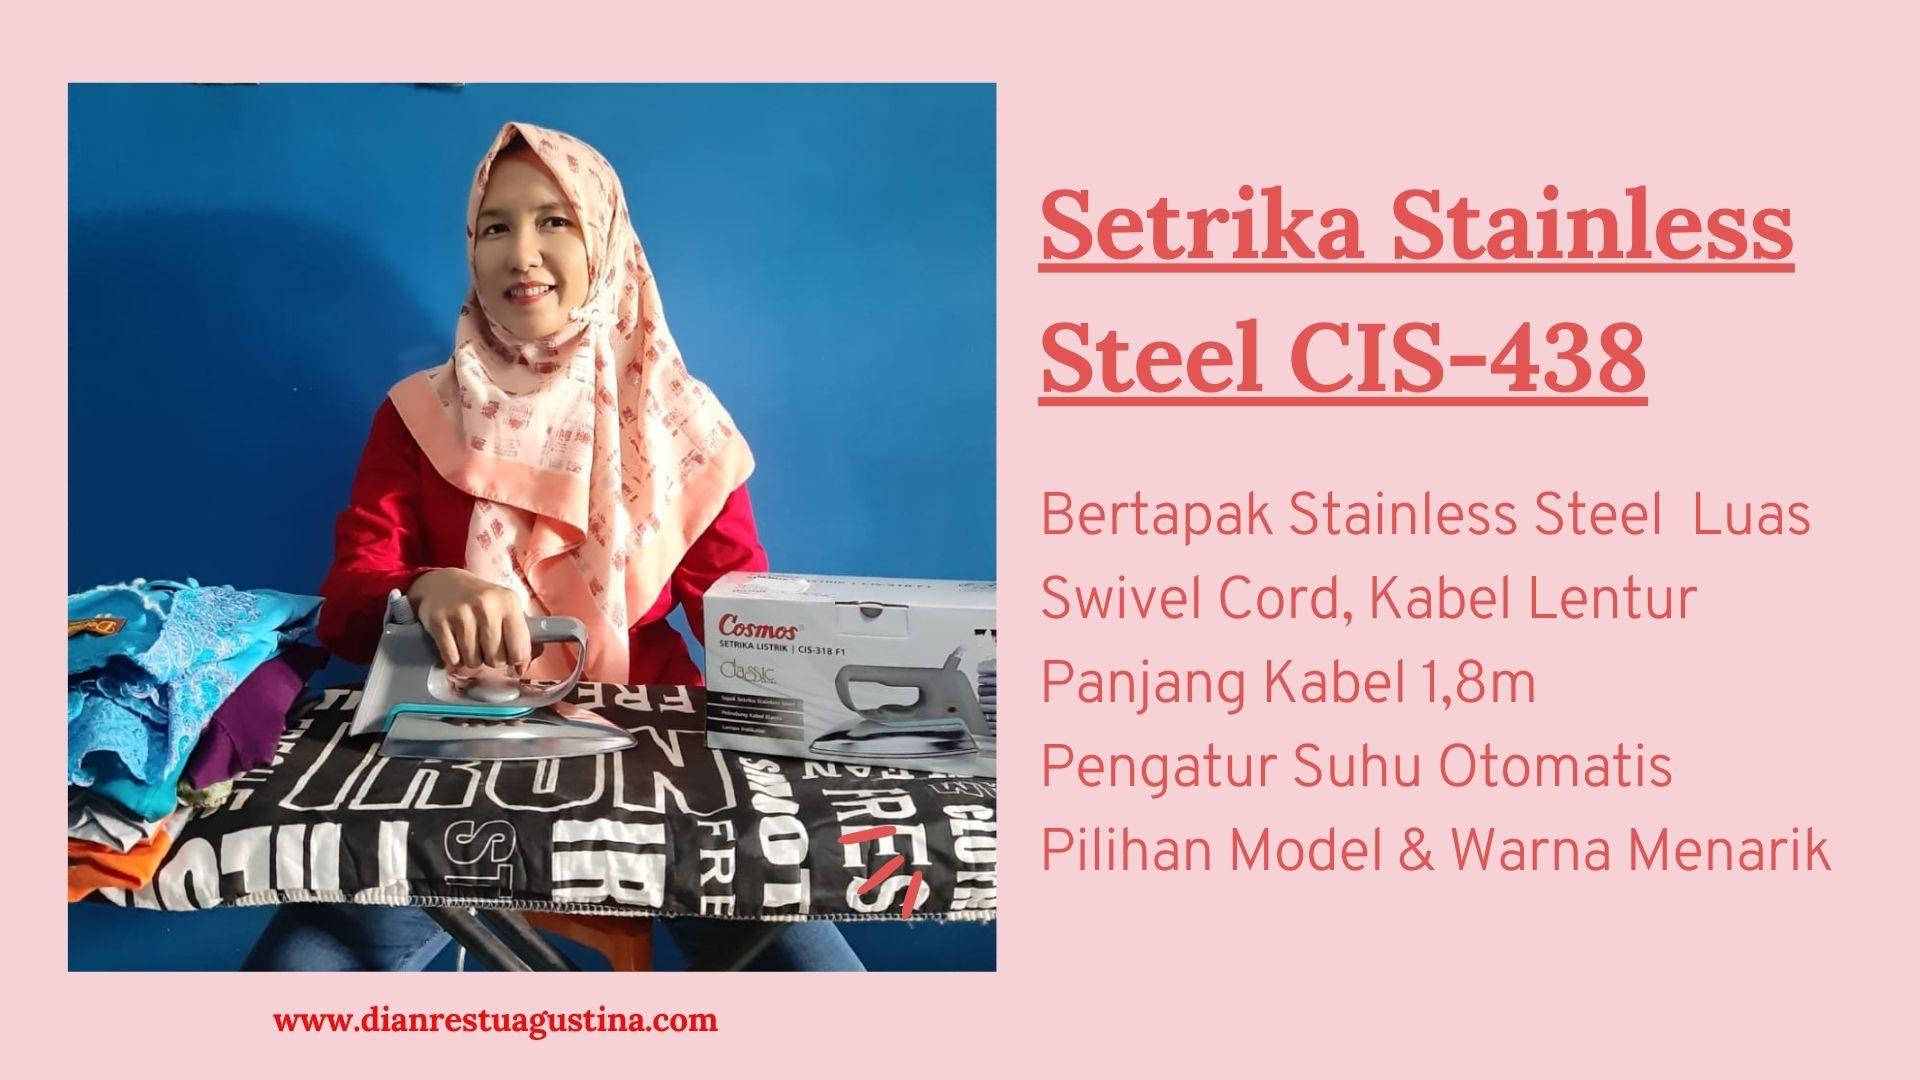 Setrika Stainless Steel Cosmos